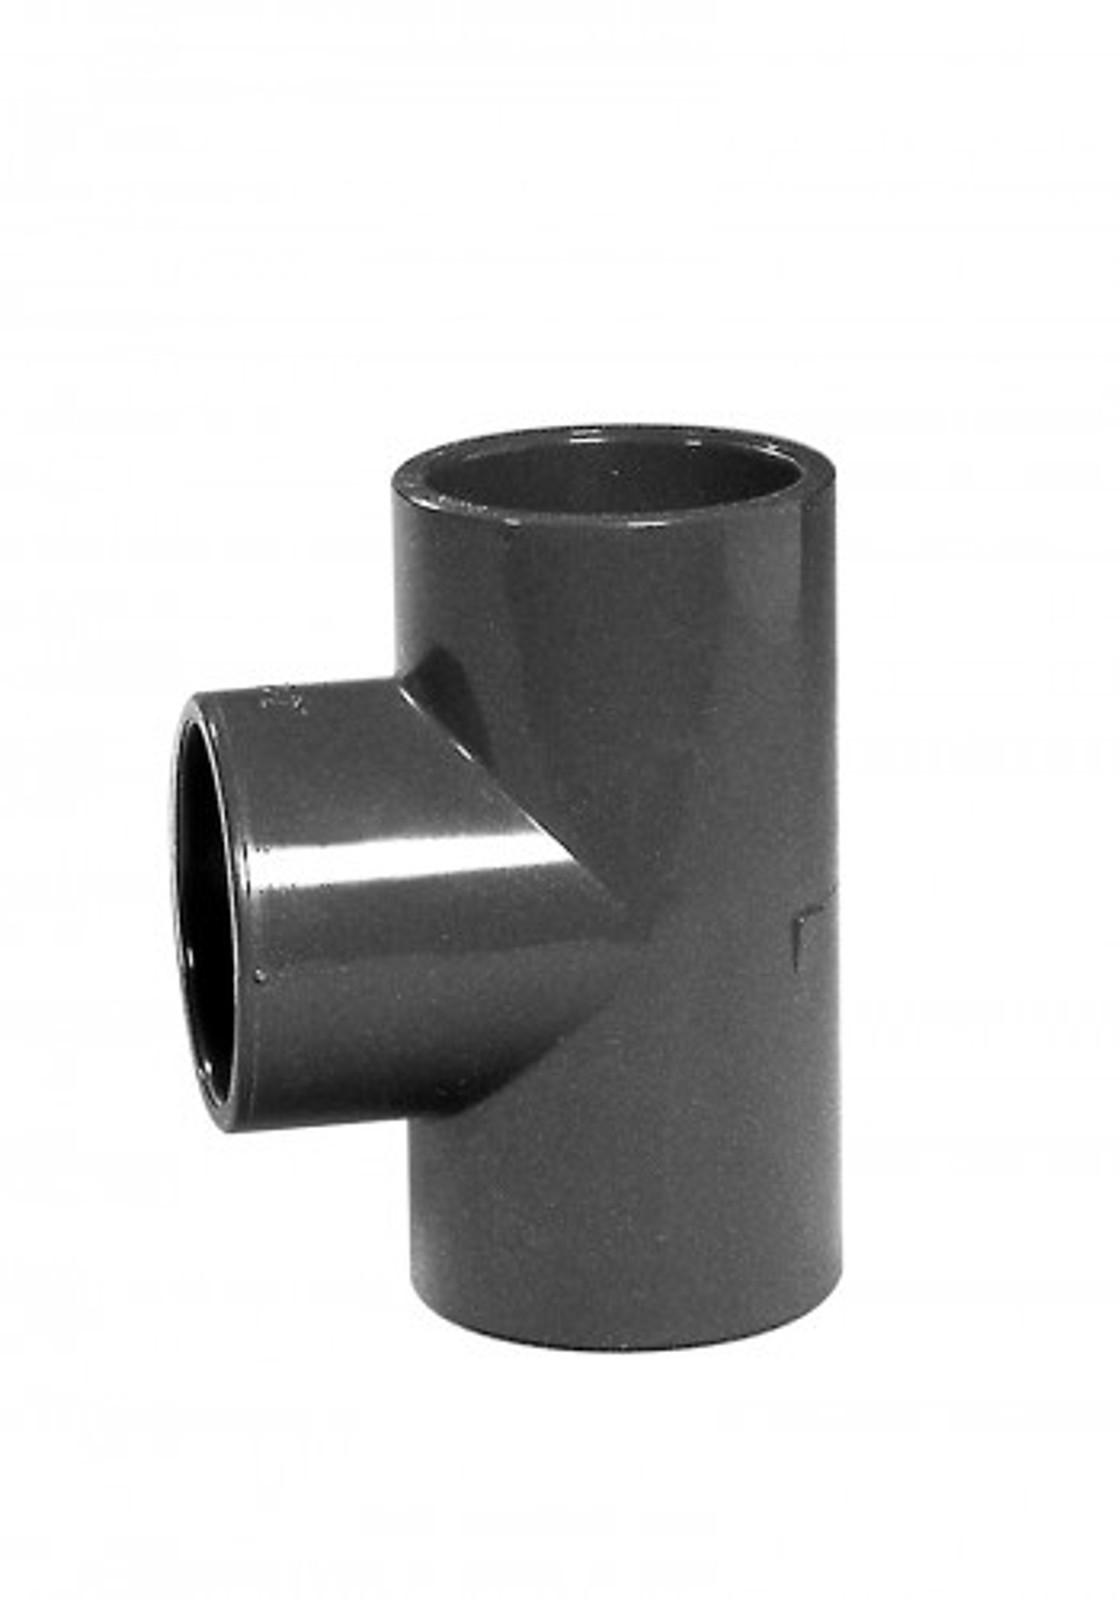 T-Stück 90°, 20 mm aus PVC